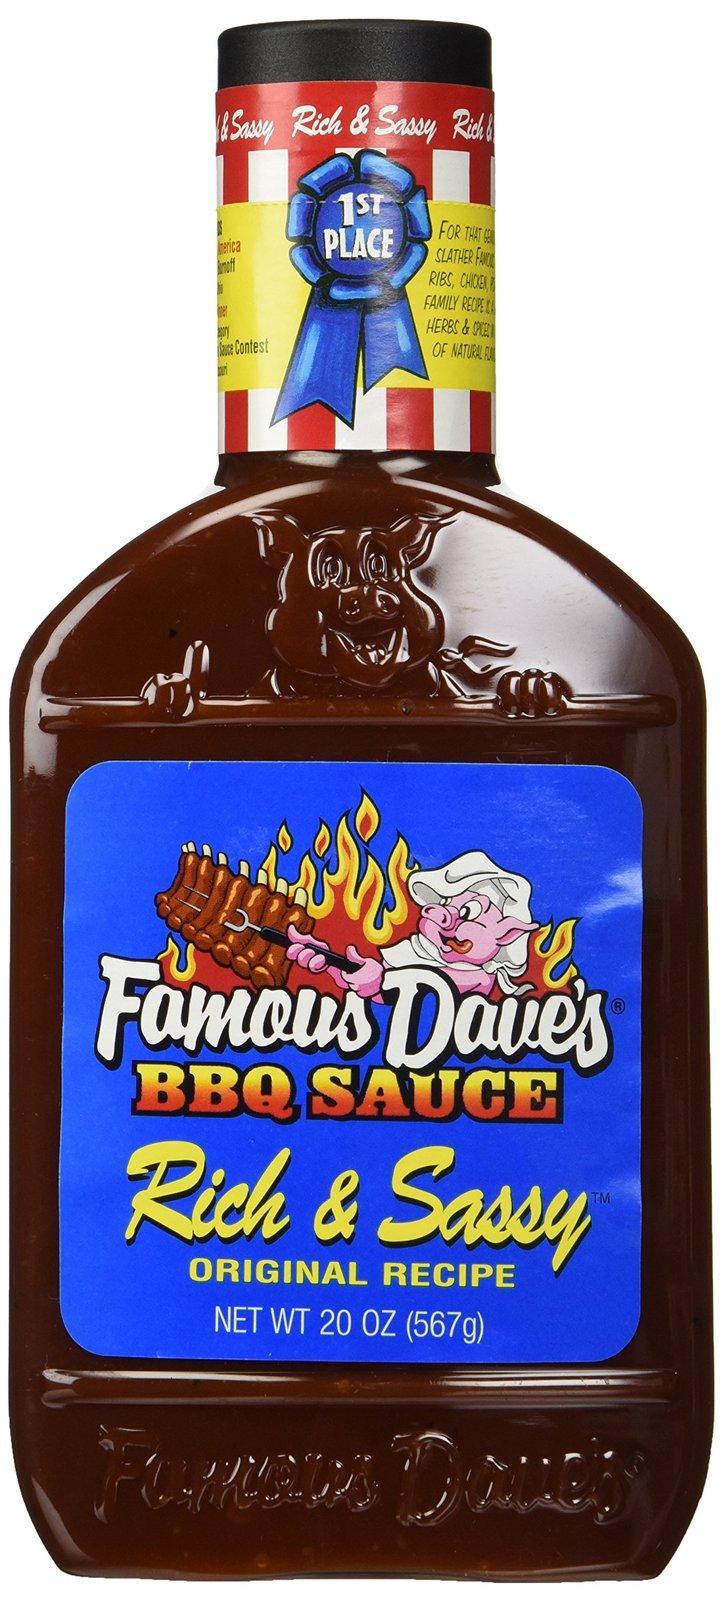 Famous Dave's BBQ, Vista, San Diego - Urbanspoon/Zomato